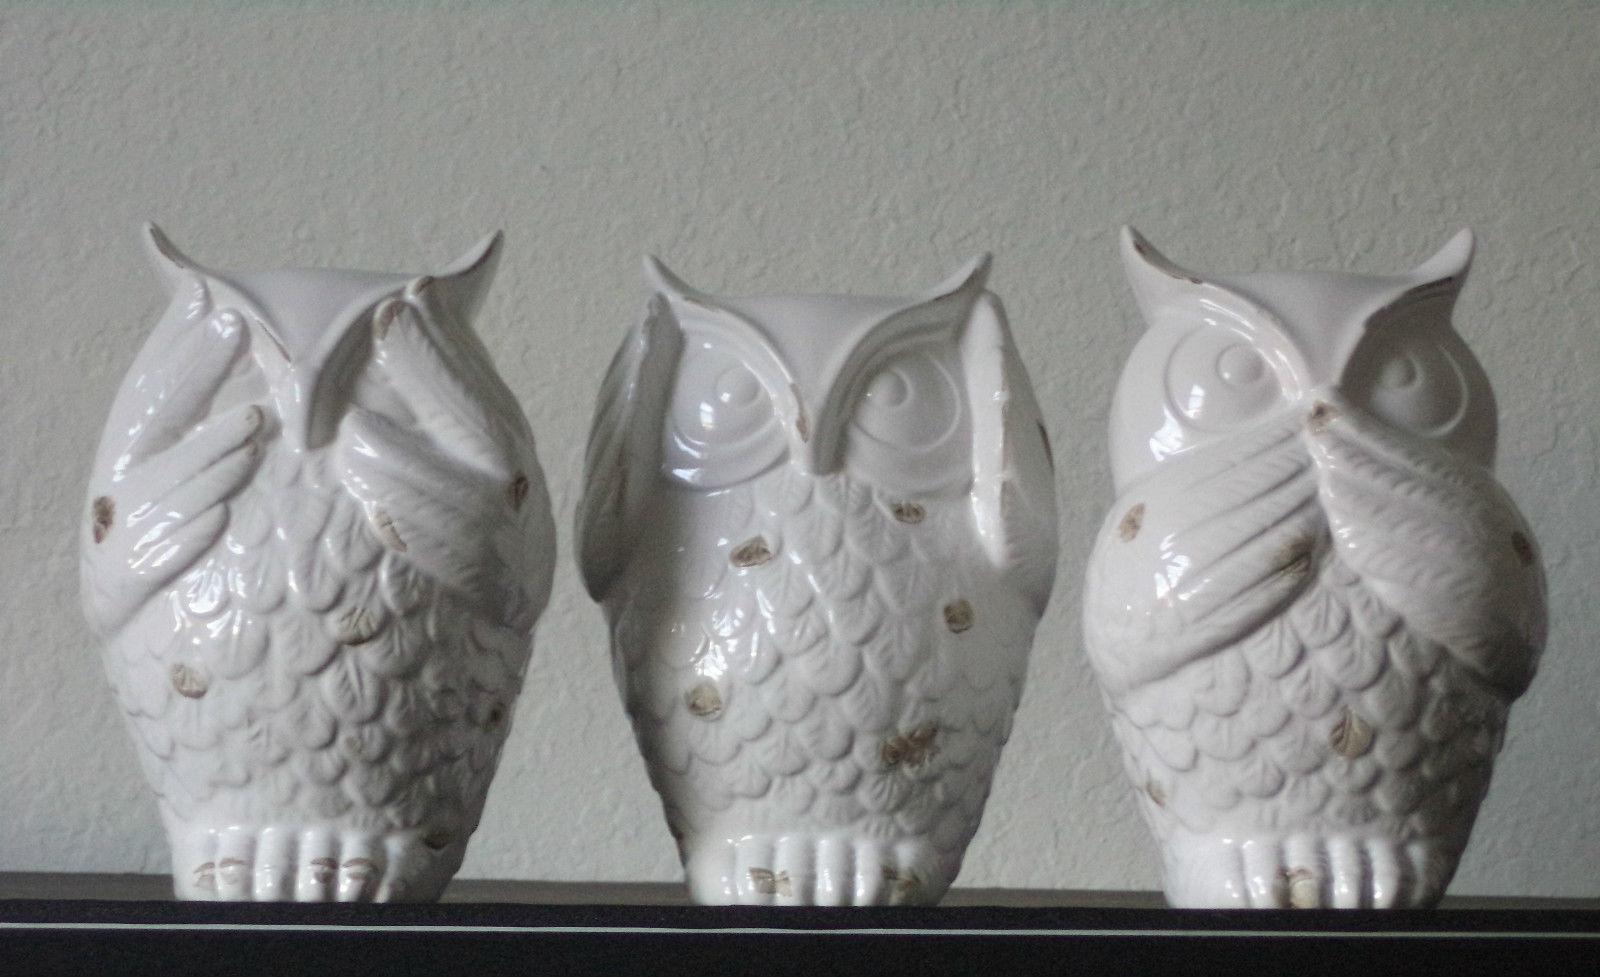 New see hear speak no evil wise owl statutes bird ceramic white home decor figurines - Hear no evil owls ceramic ...